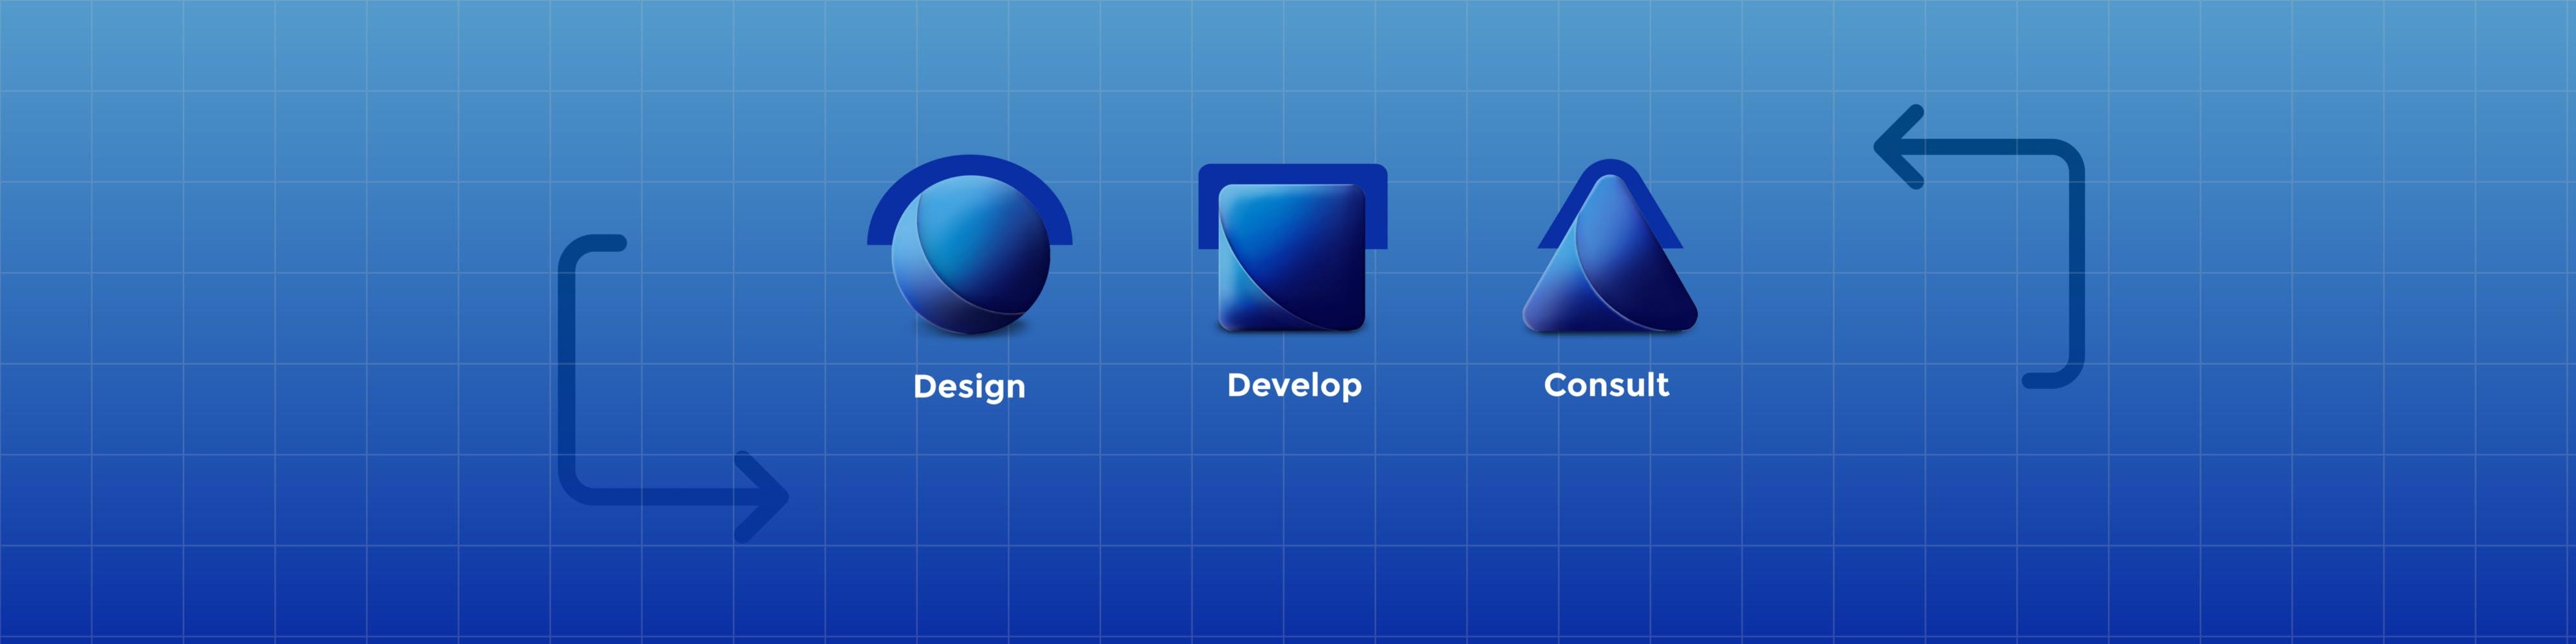 Three main pillars of software development process in Quinteessential sft